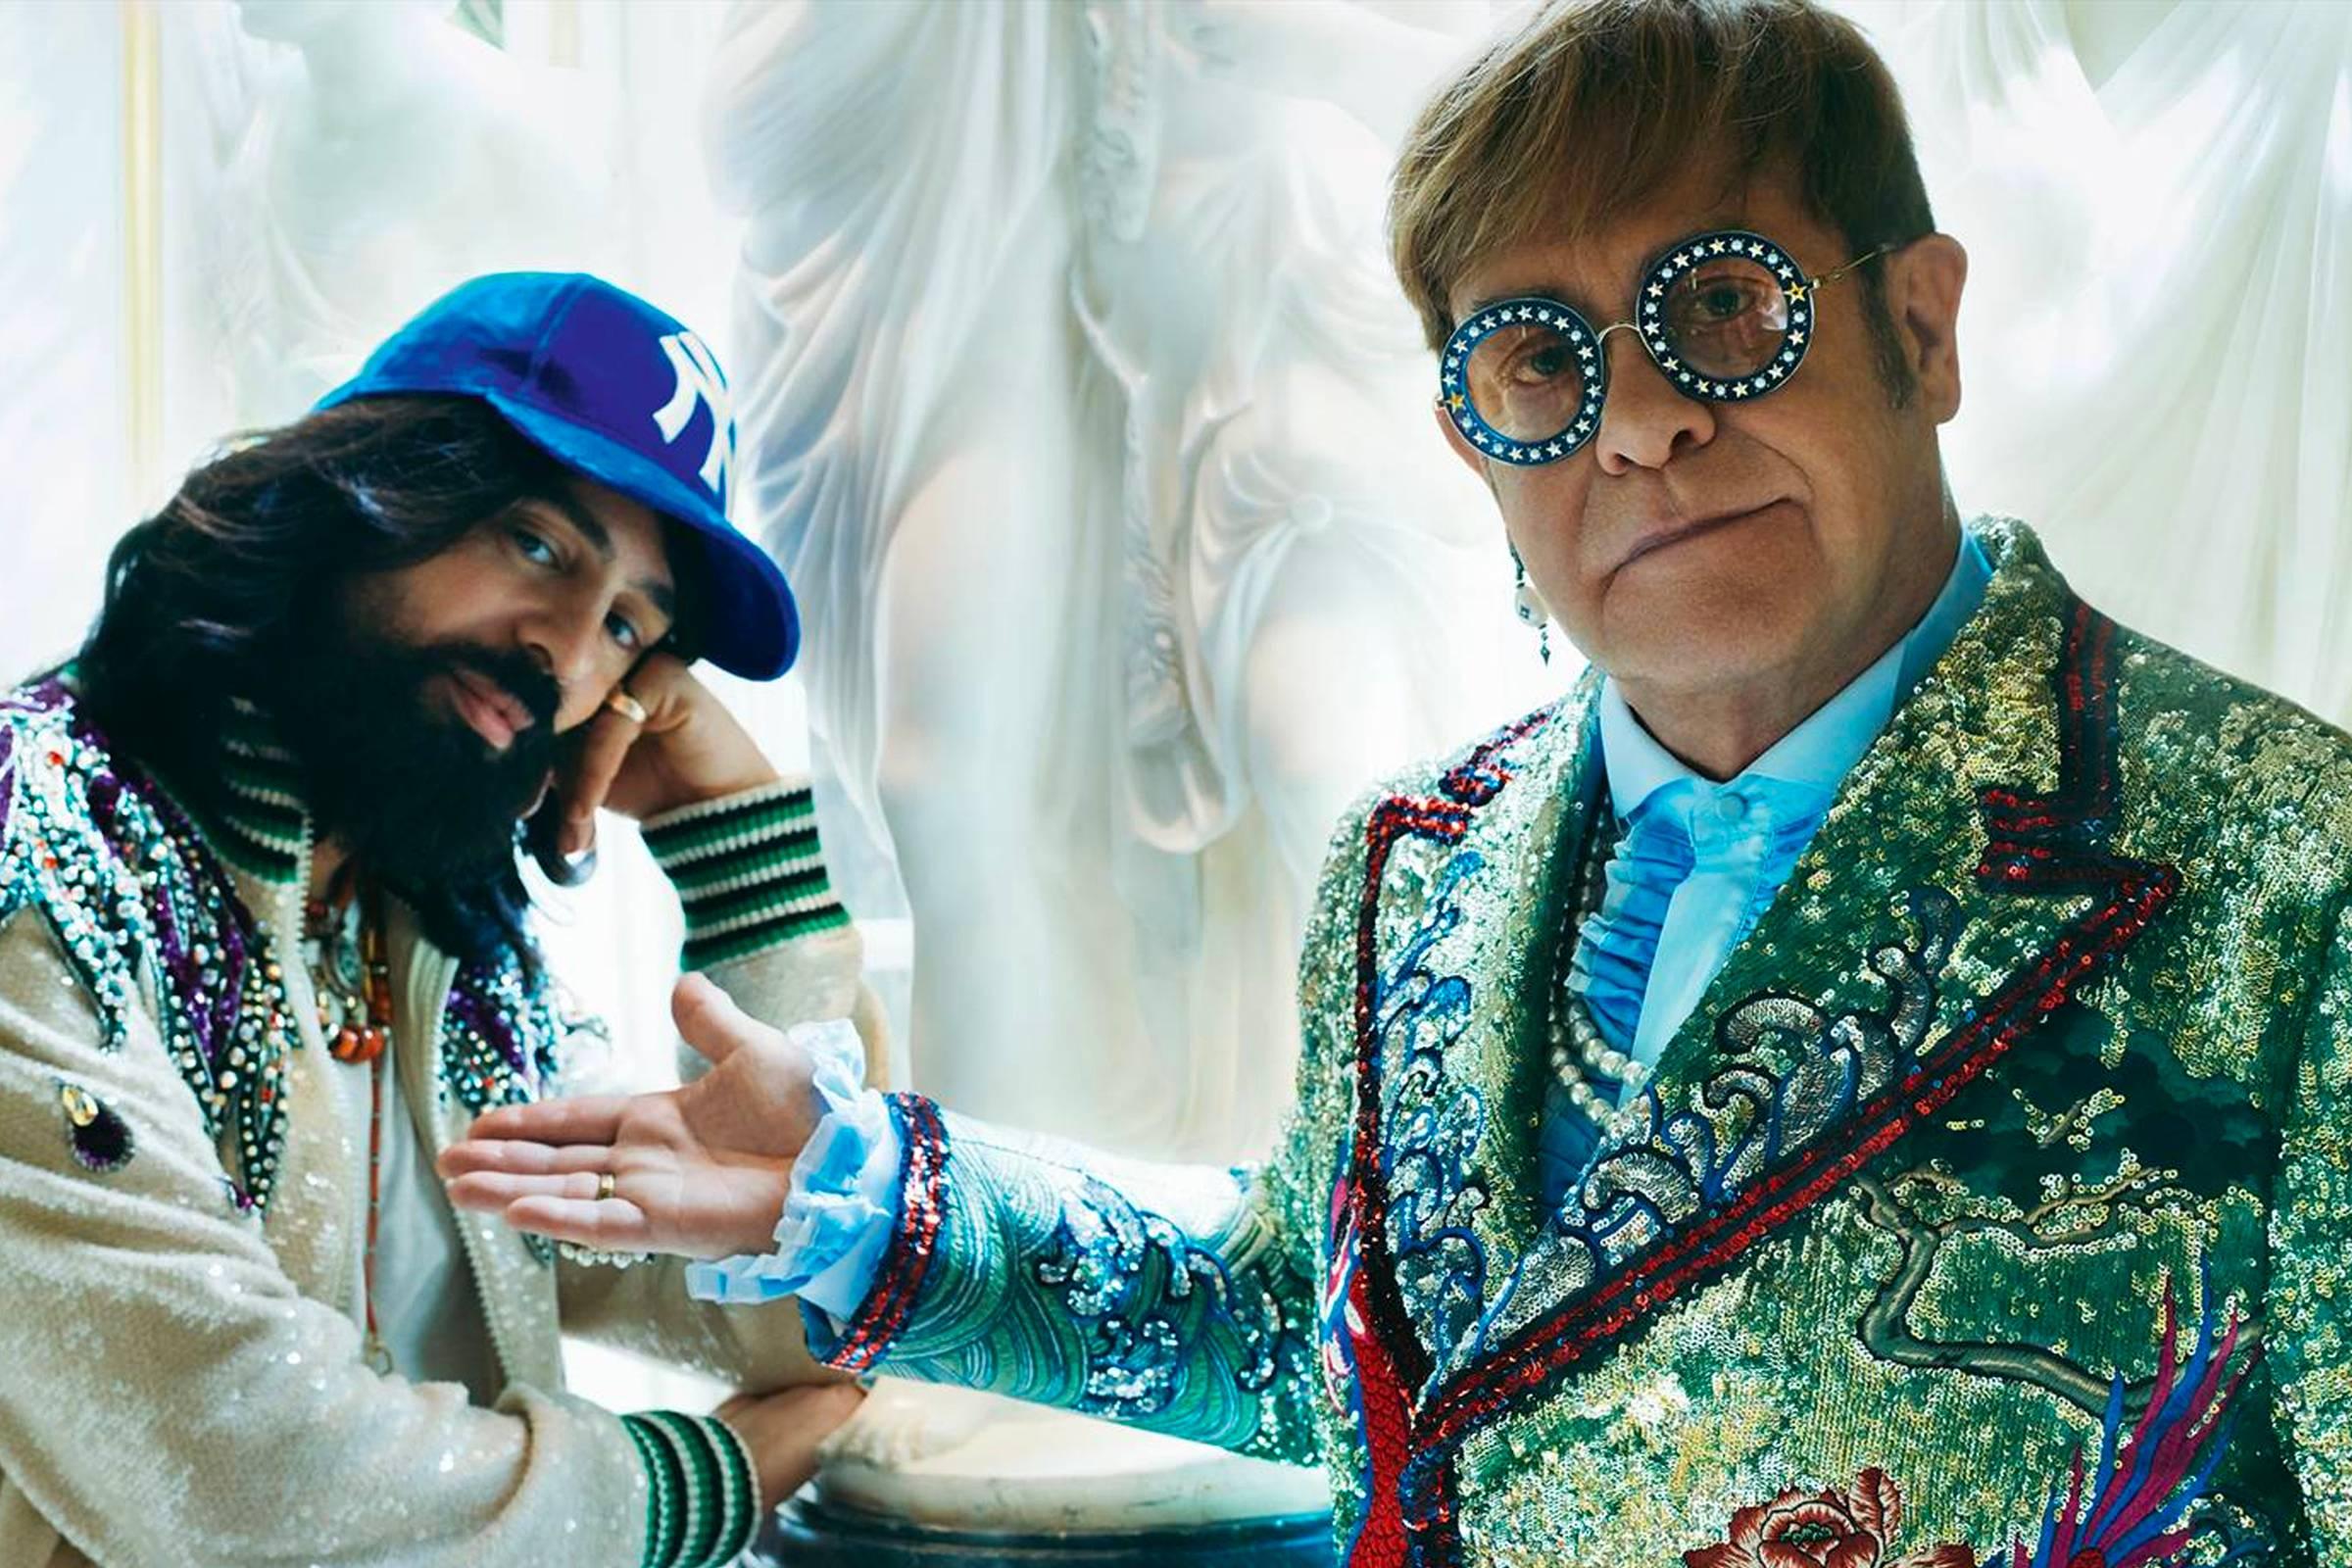 Rocketman: The Style of Elton John